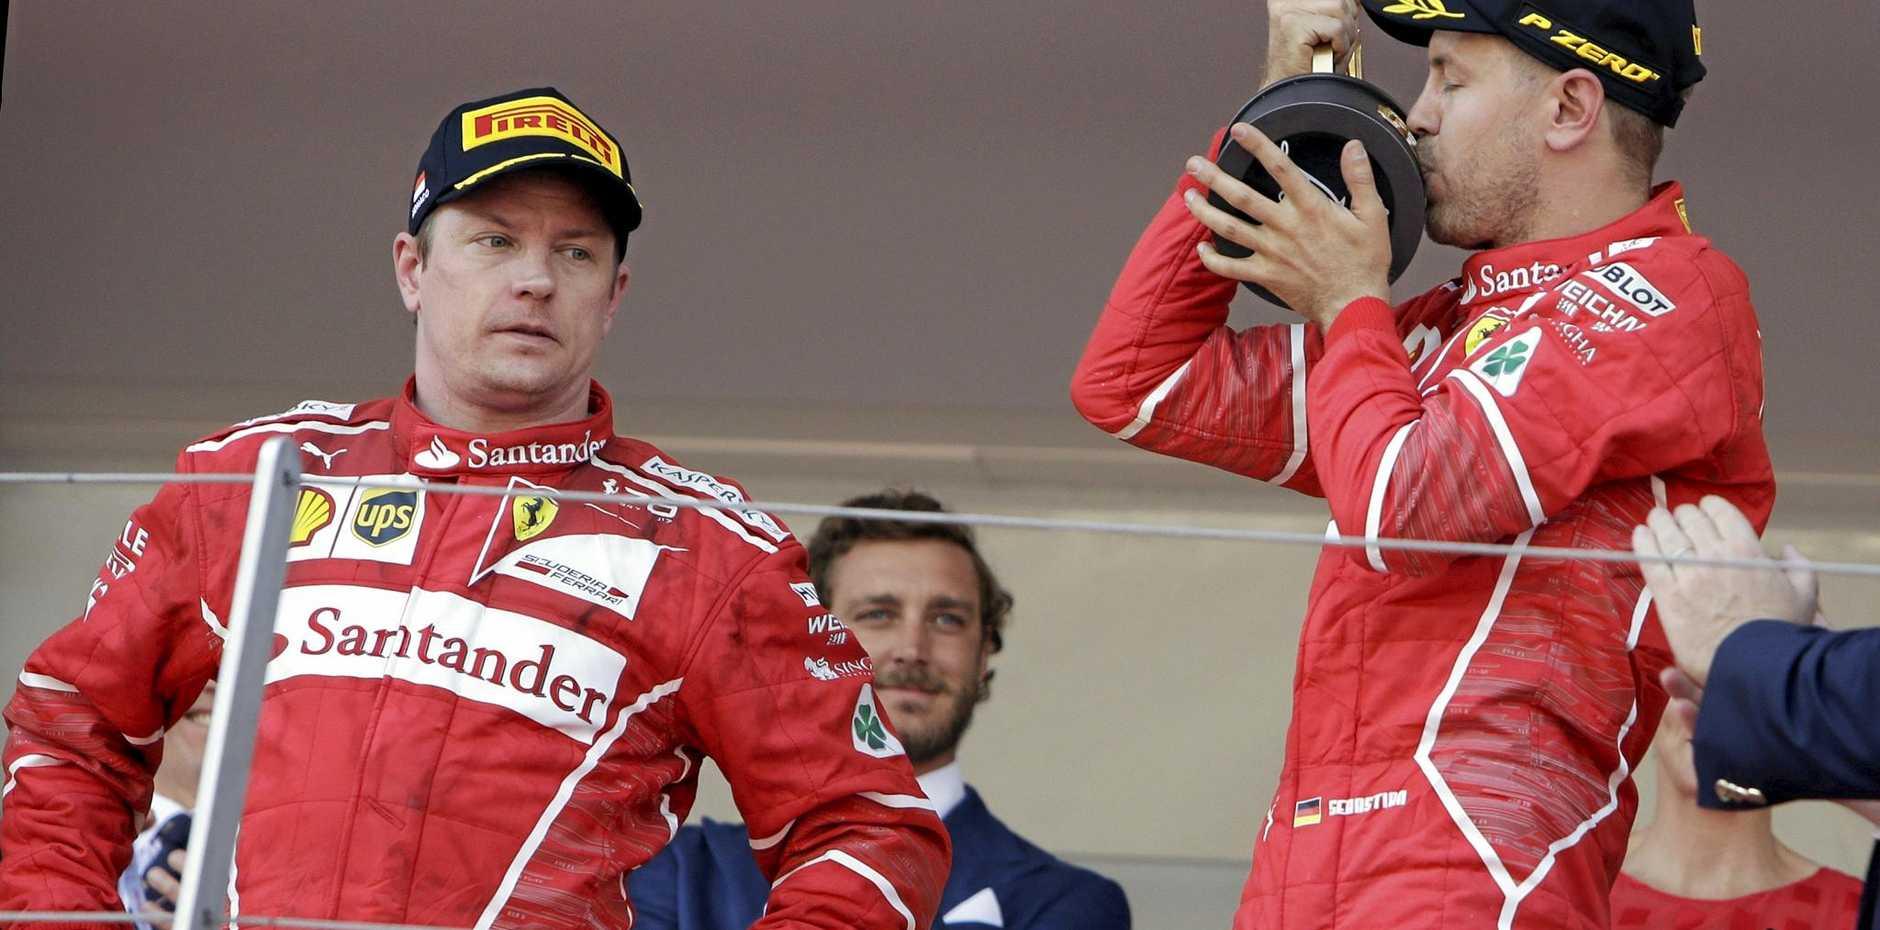 Ferrari driver Sebastian Vettel (left) of Germany celebrates beside his second-placed teammate Kimi Raikkonen of Finland at the Monaco Grand Prix.